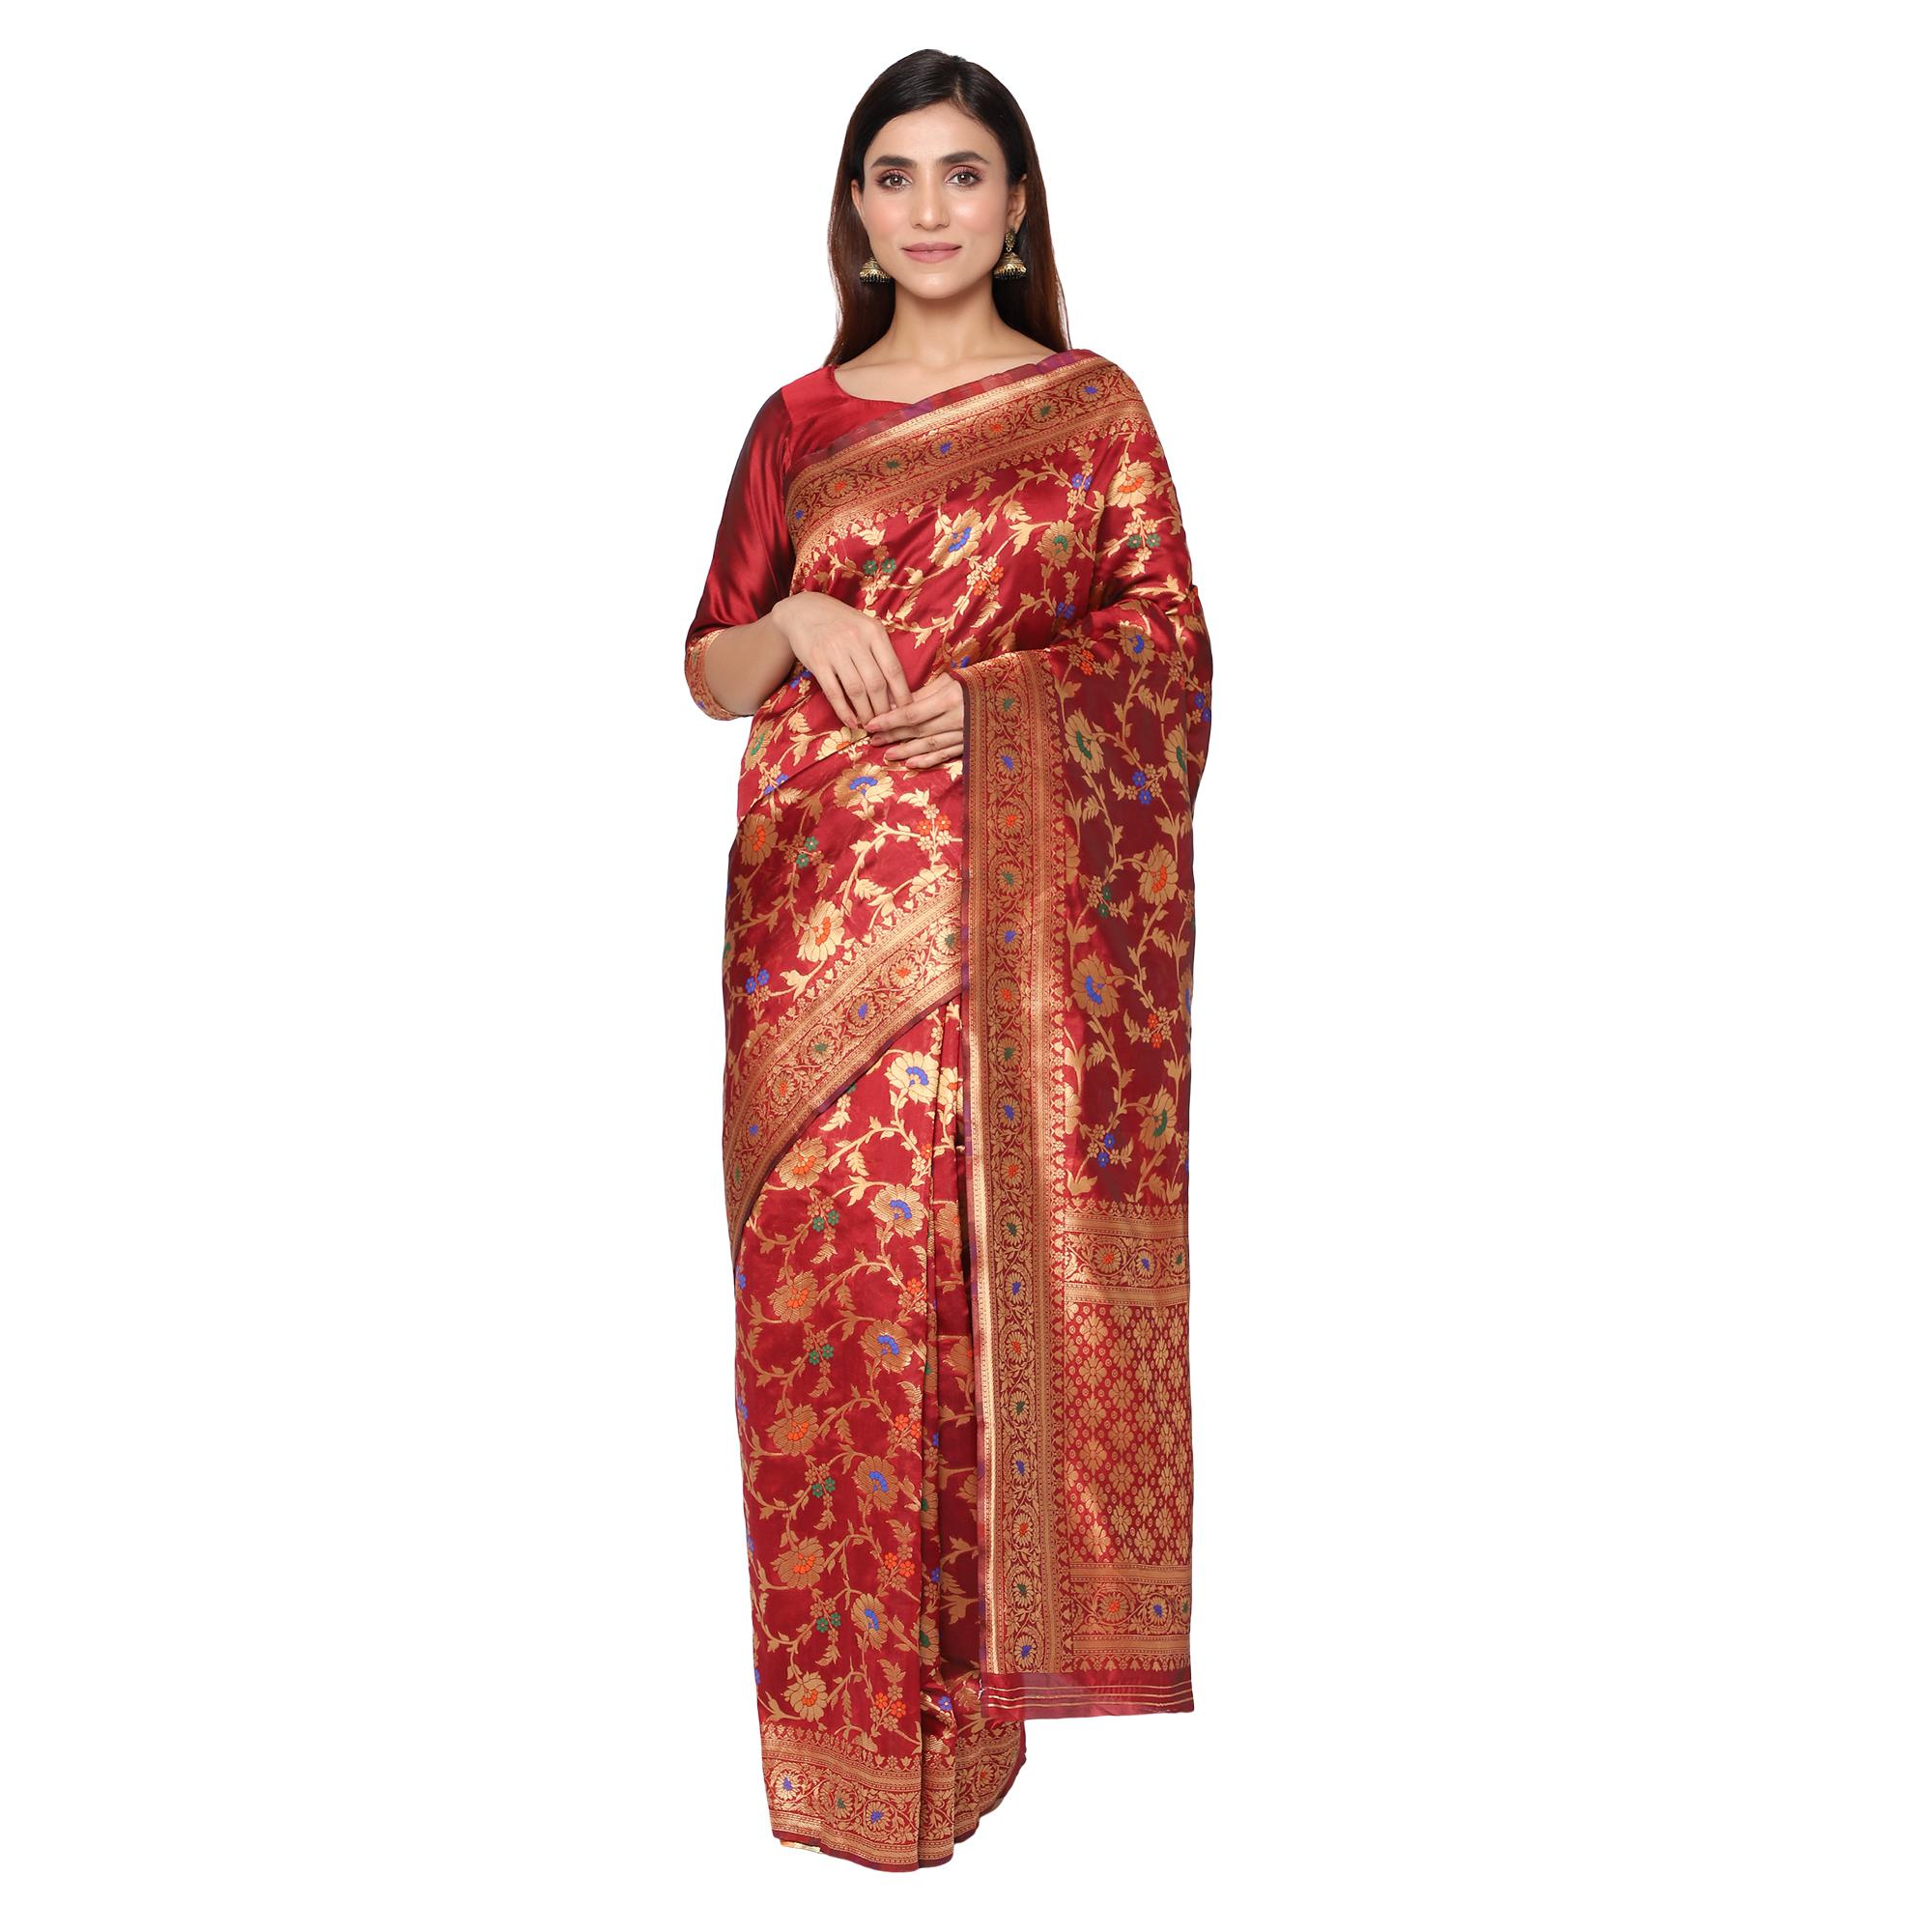 Glemora | Glemora Maroon Beautiful Ethnic Wear Silk Blend Banarasi Traditional Saree